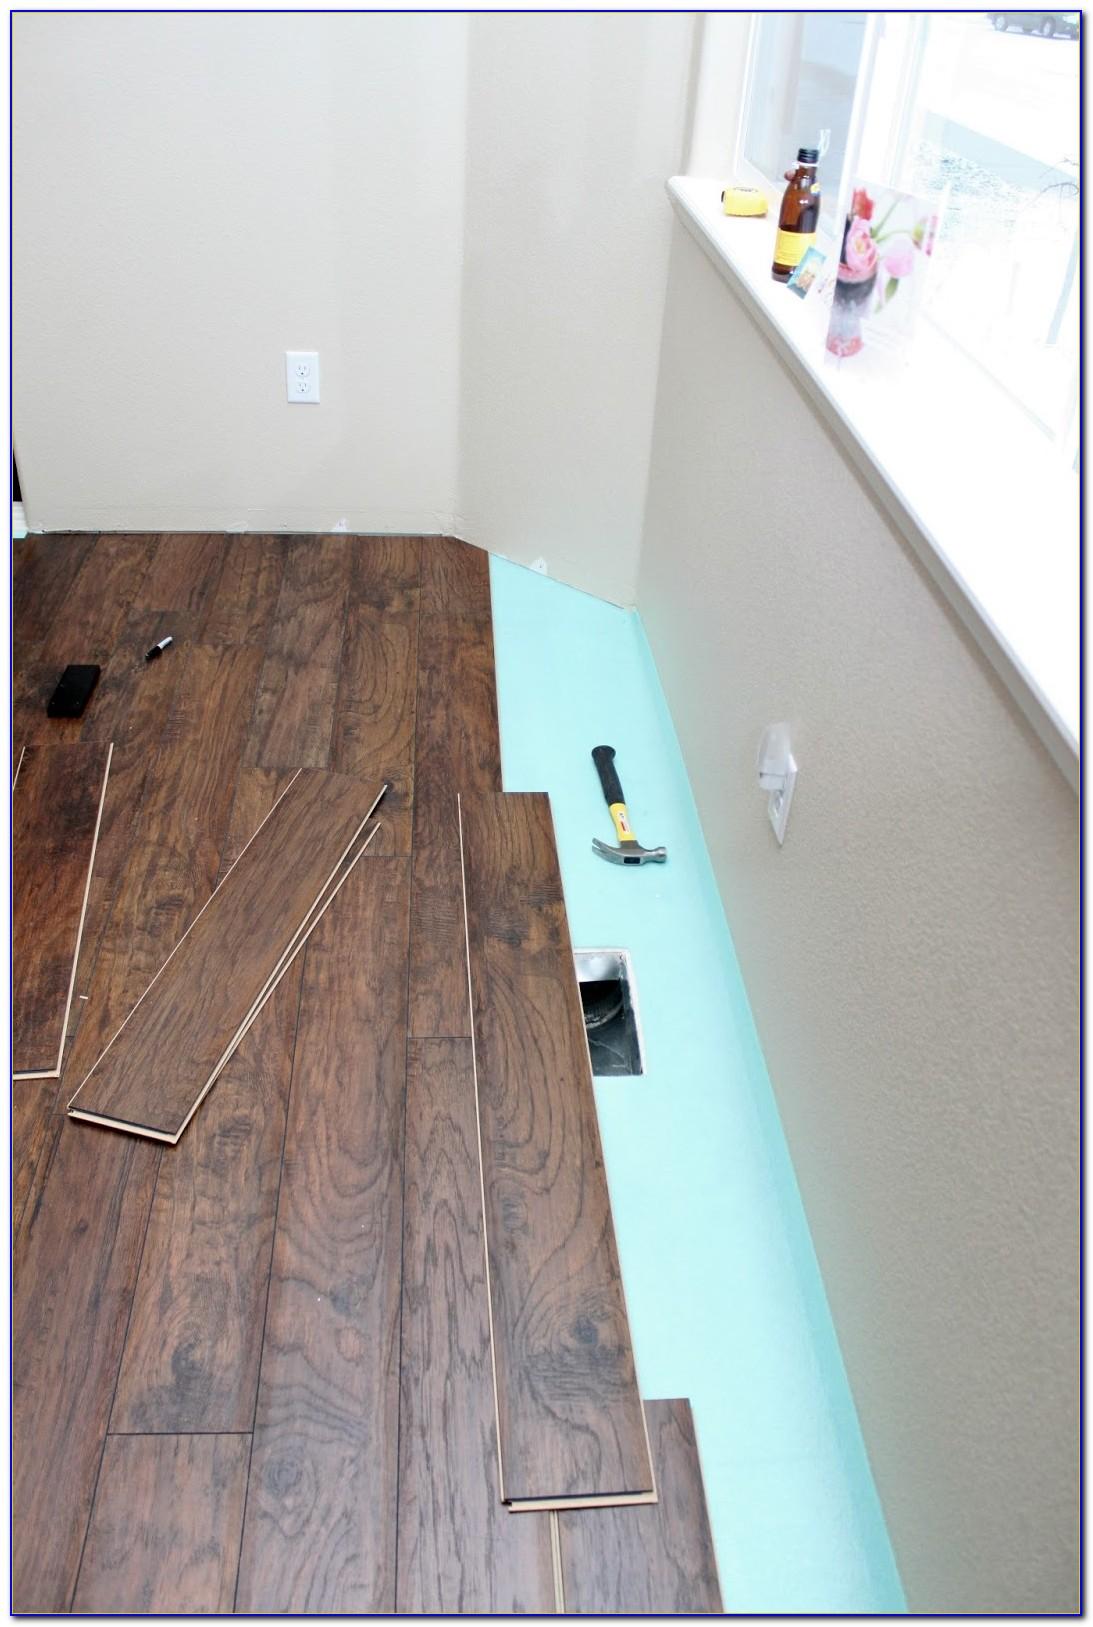 Hampton Bay Laminate Flooring Installation Instructions